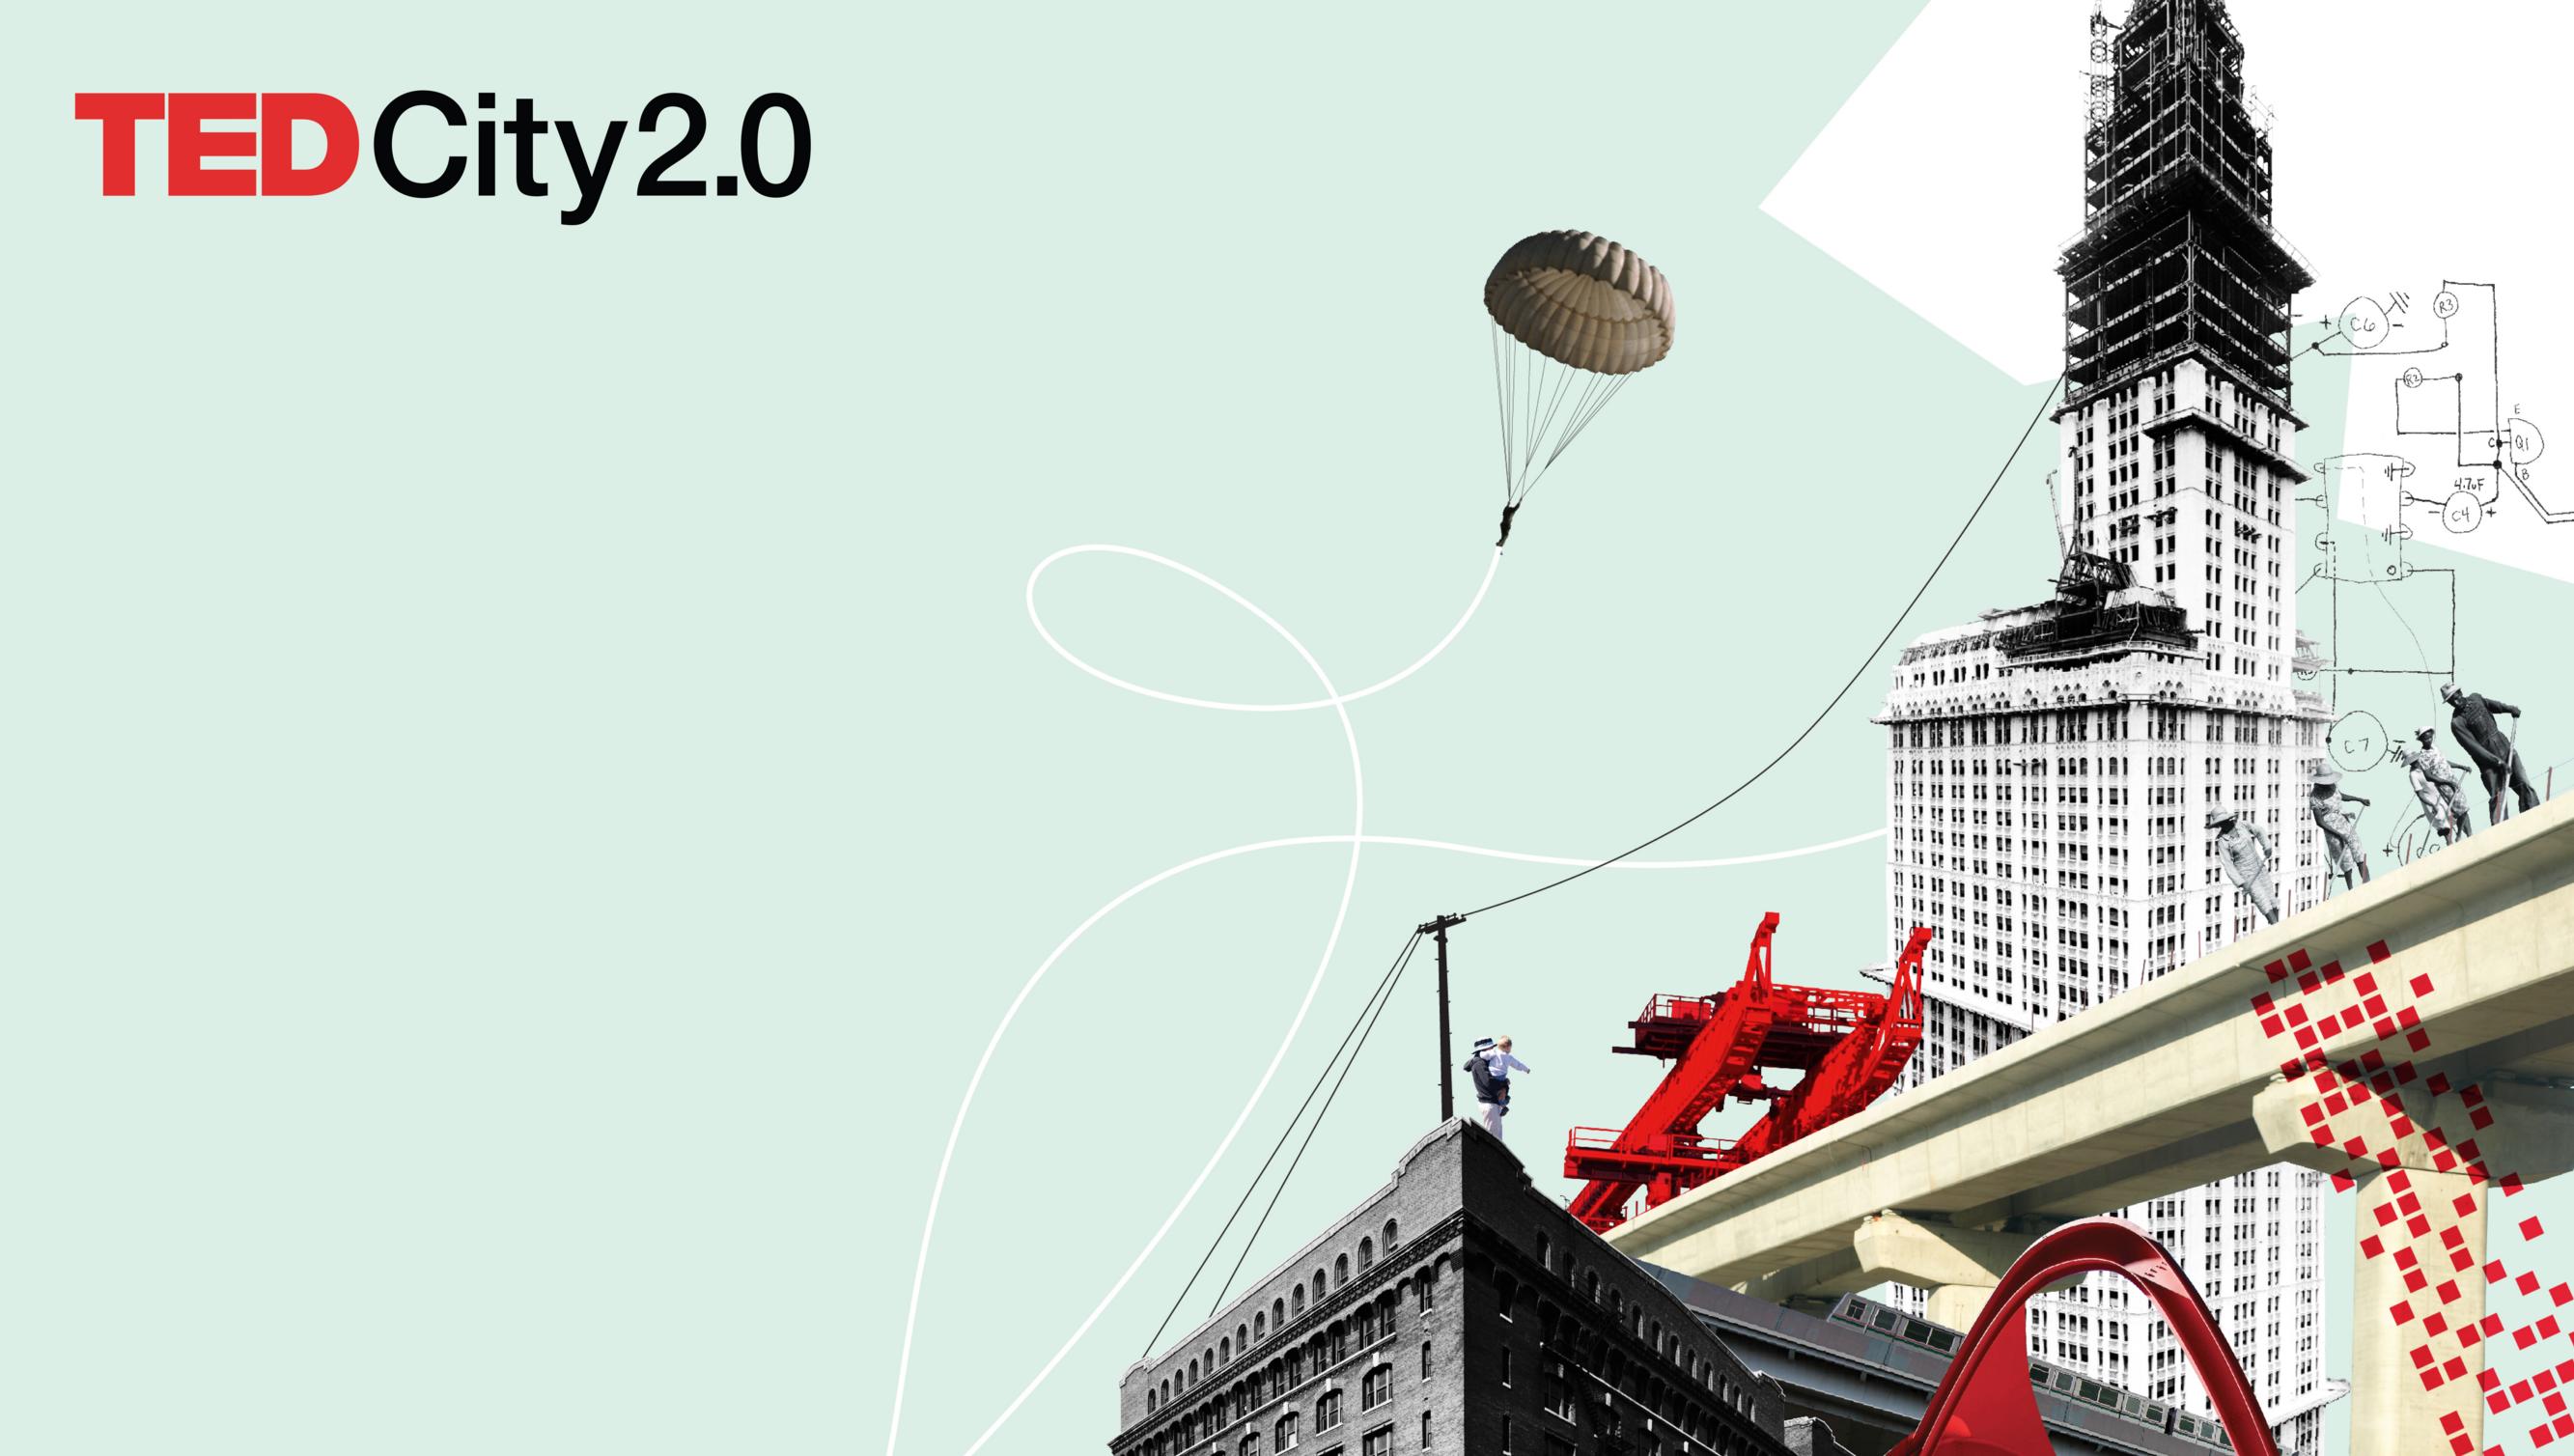 The City2.0